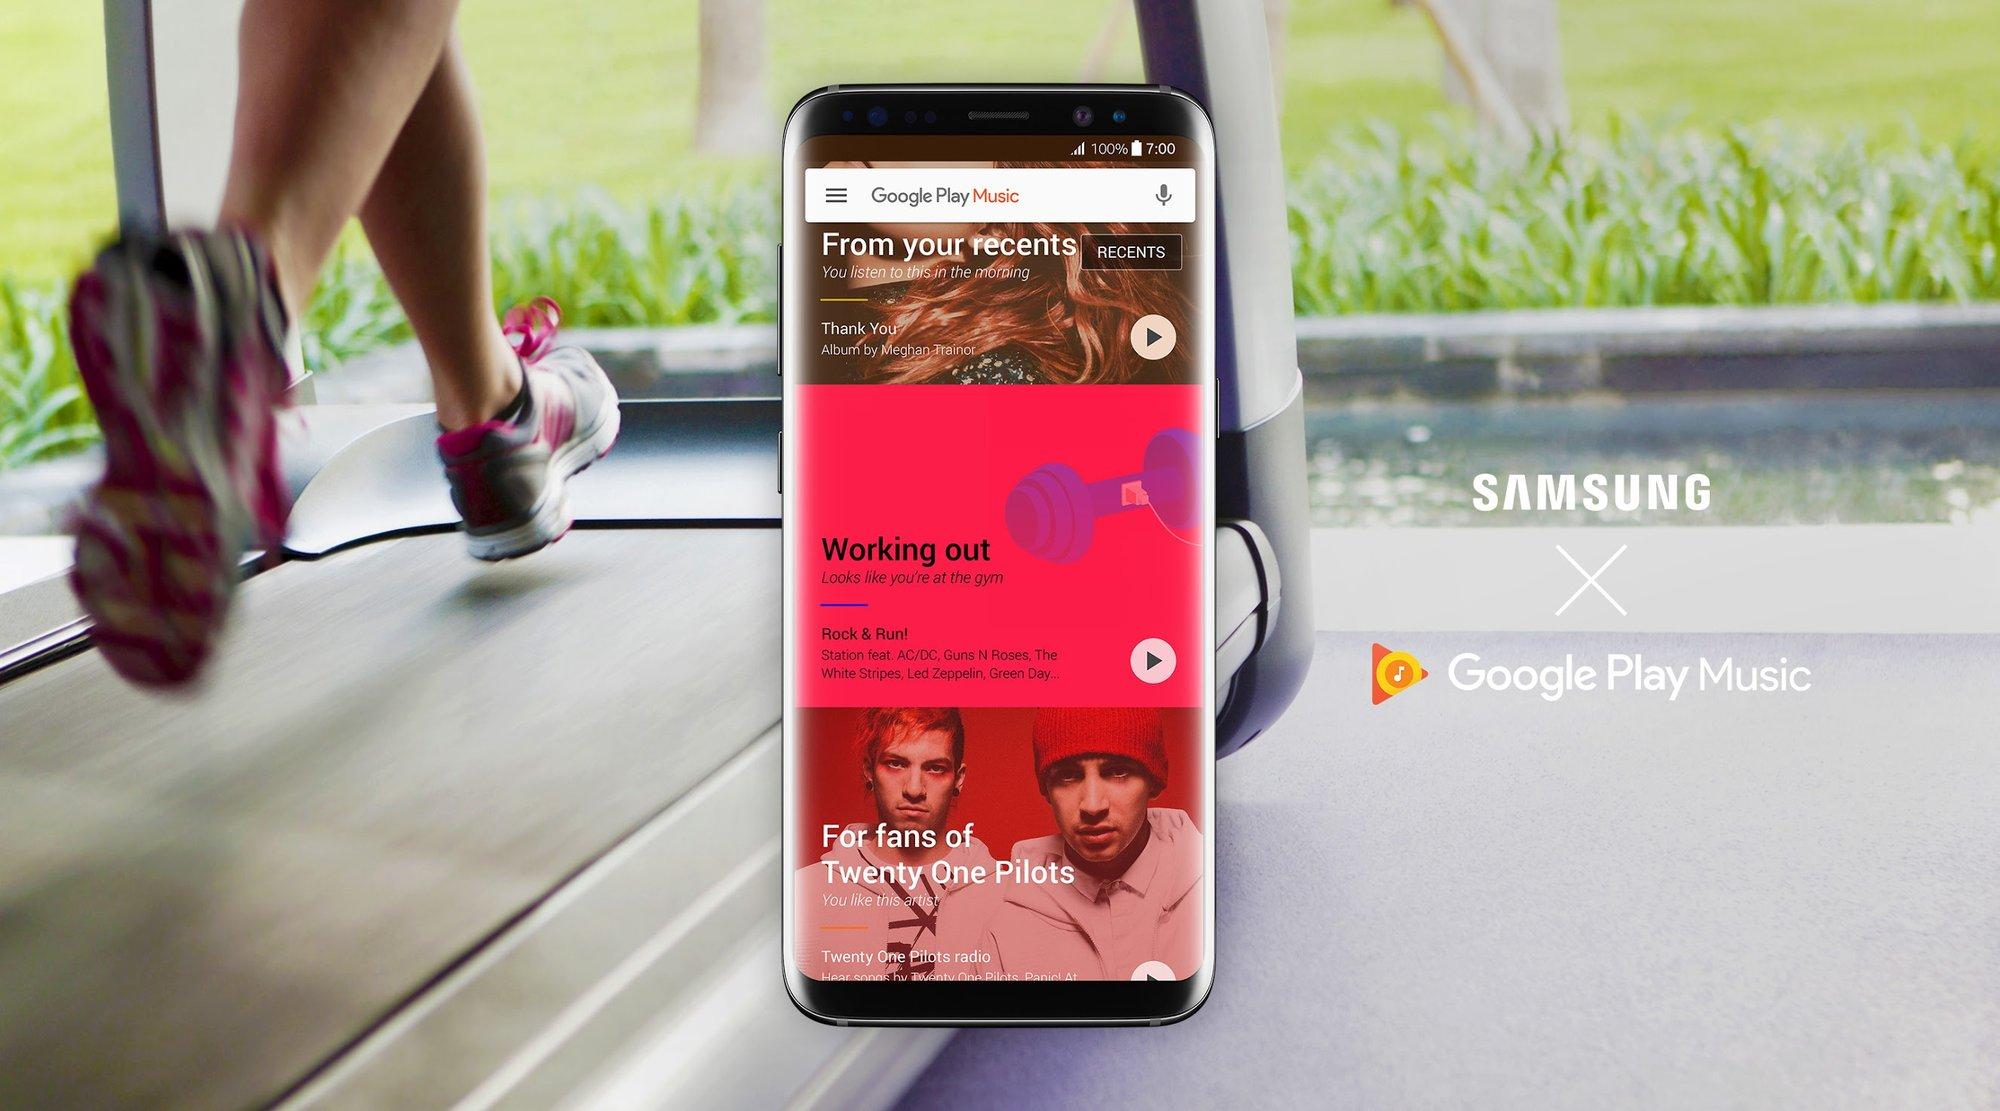 GPM + Samsung Image